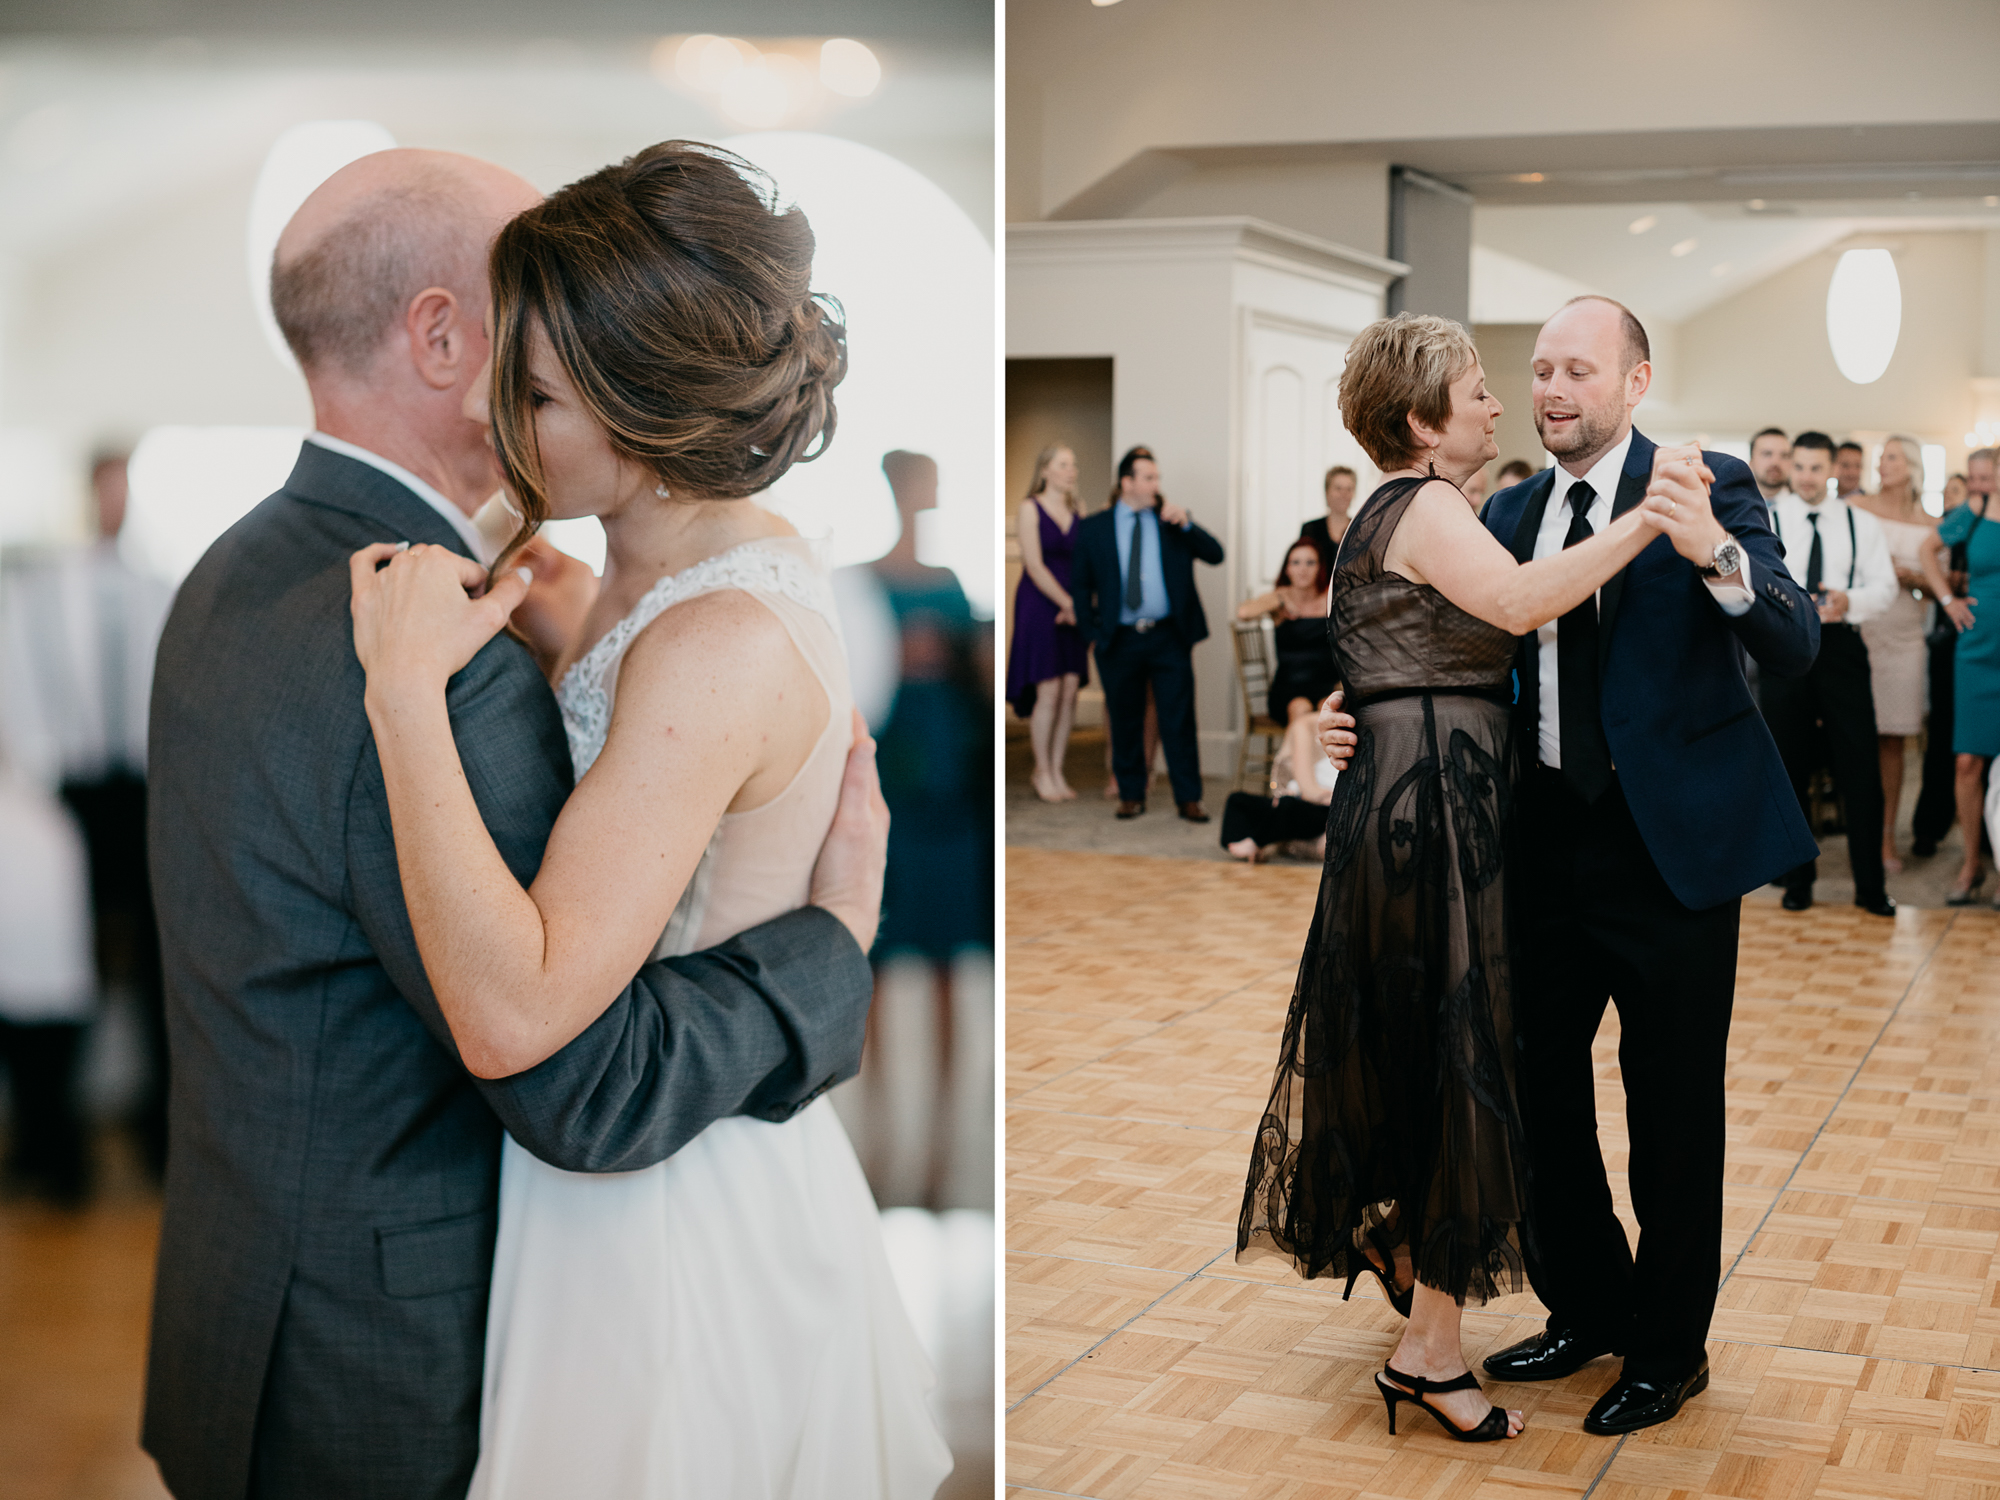 Jaclyn_Andrew_quincy_massachusetts_wedding028.jpg